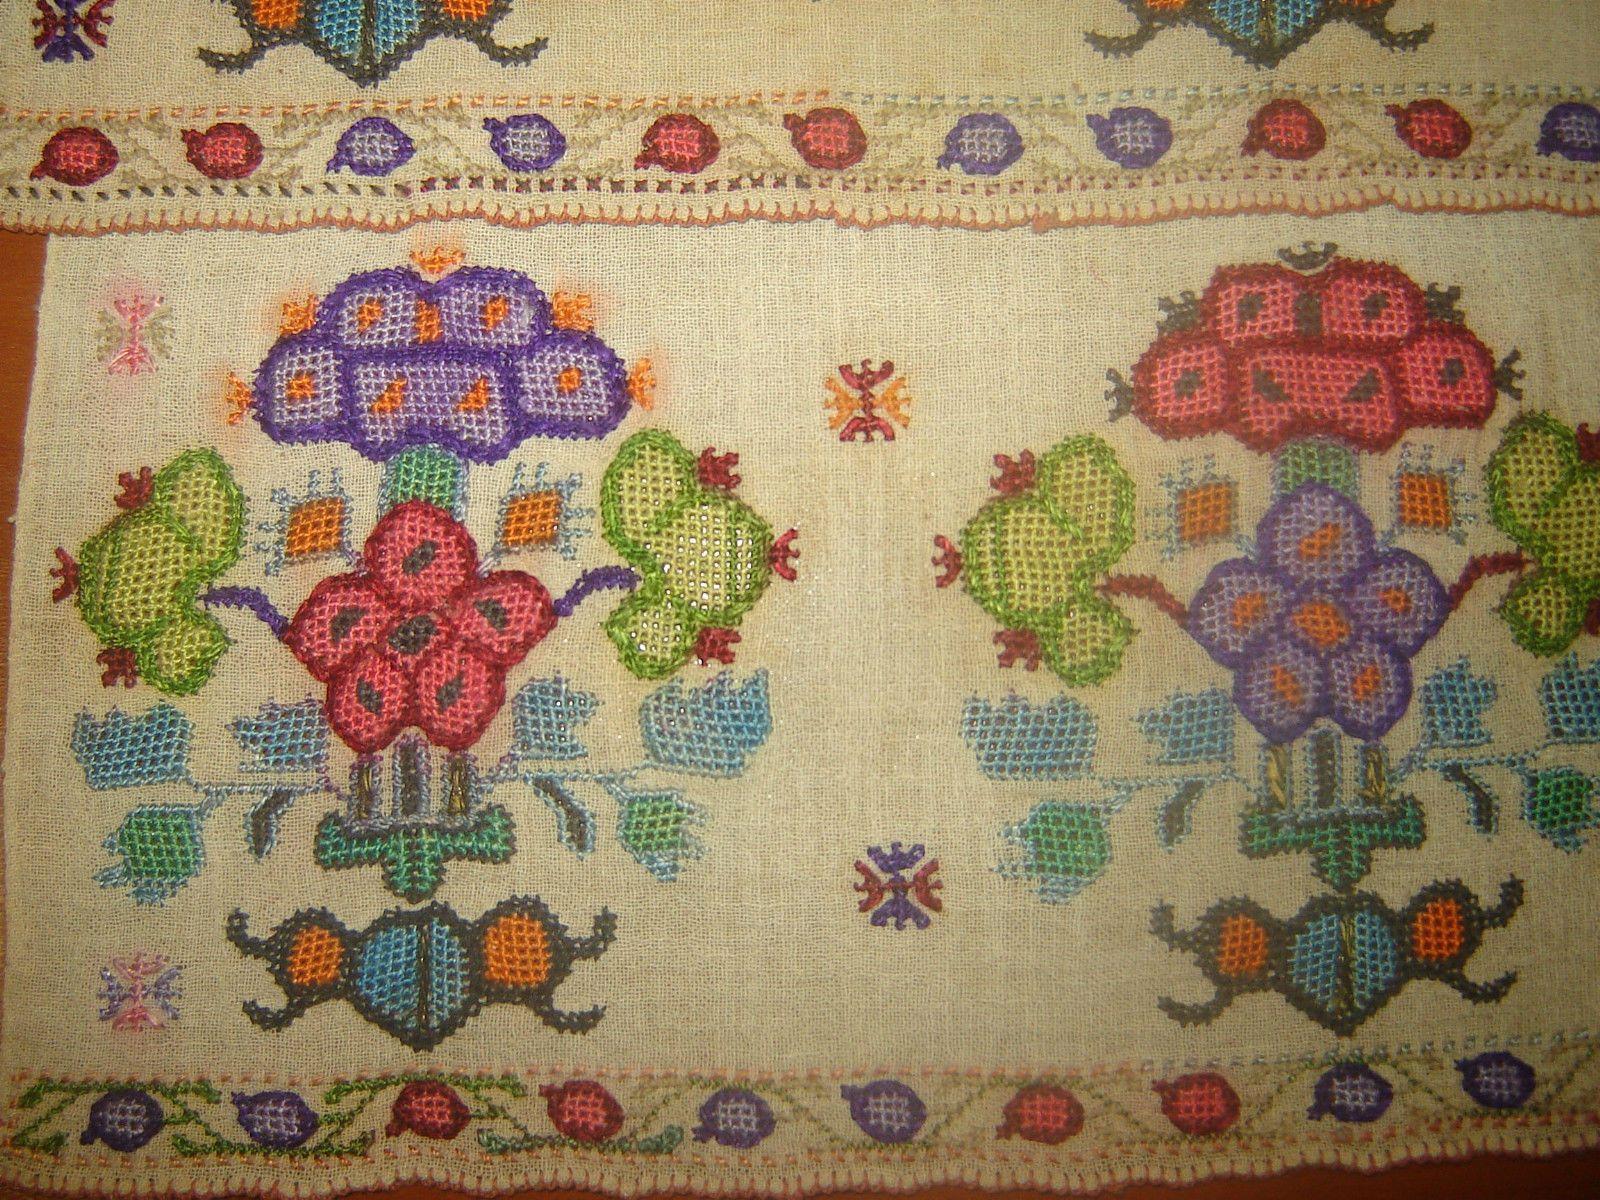 19th C Antique Ottoman Turkish Hand Embroidery On Linen 039 Yalik